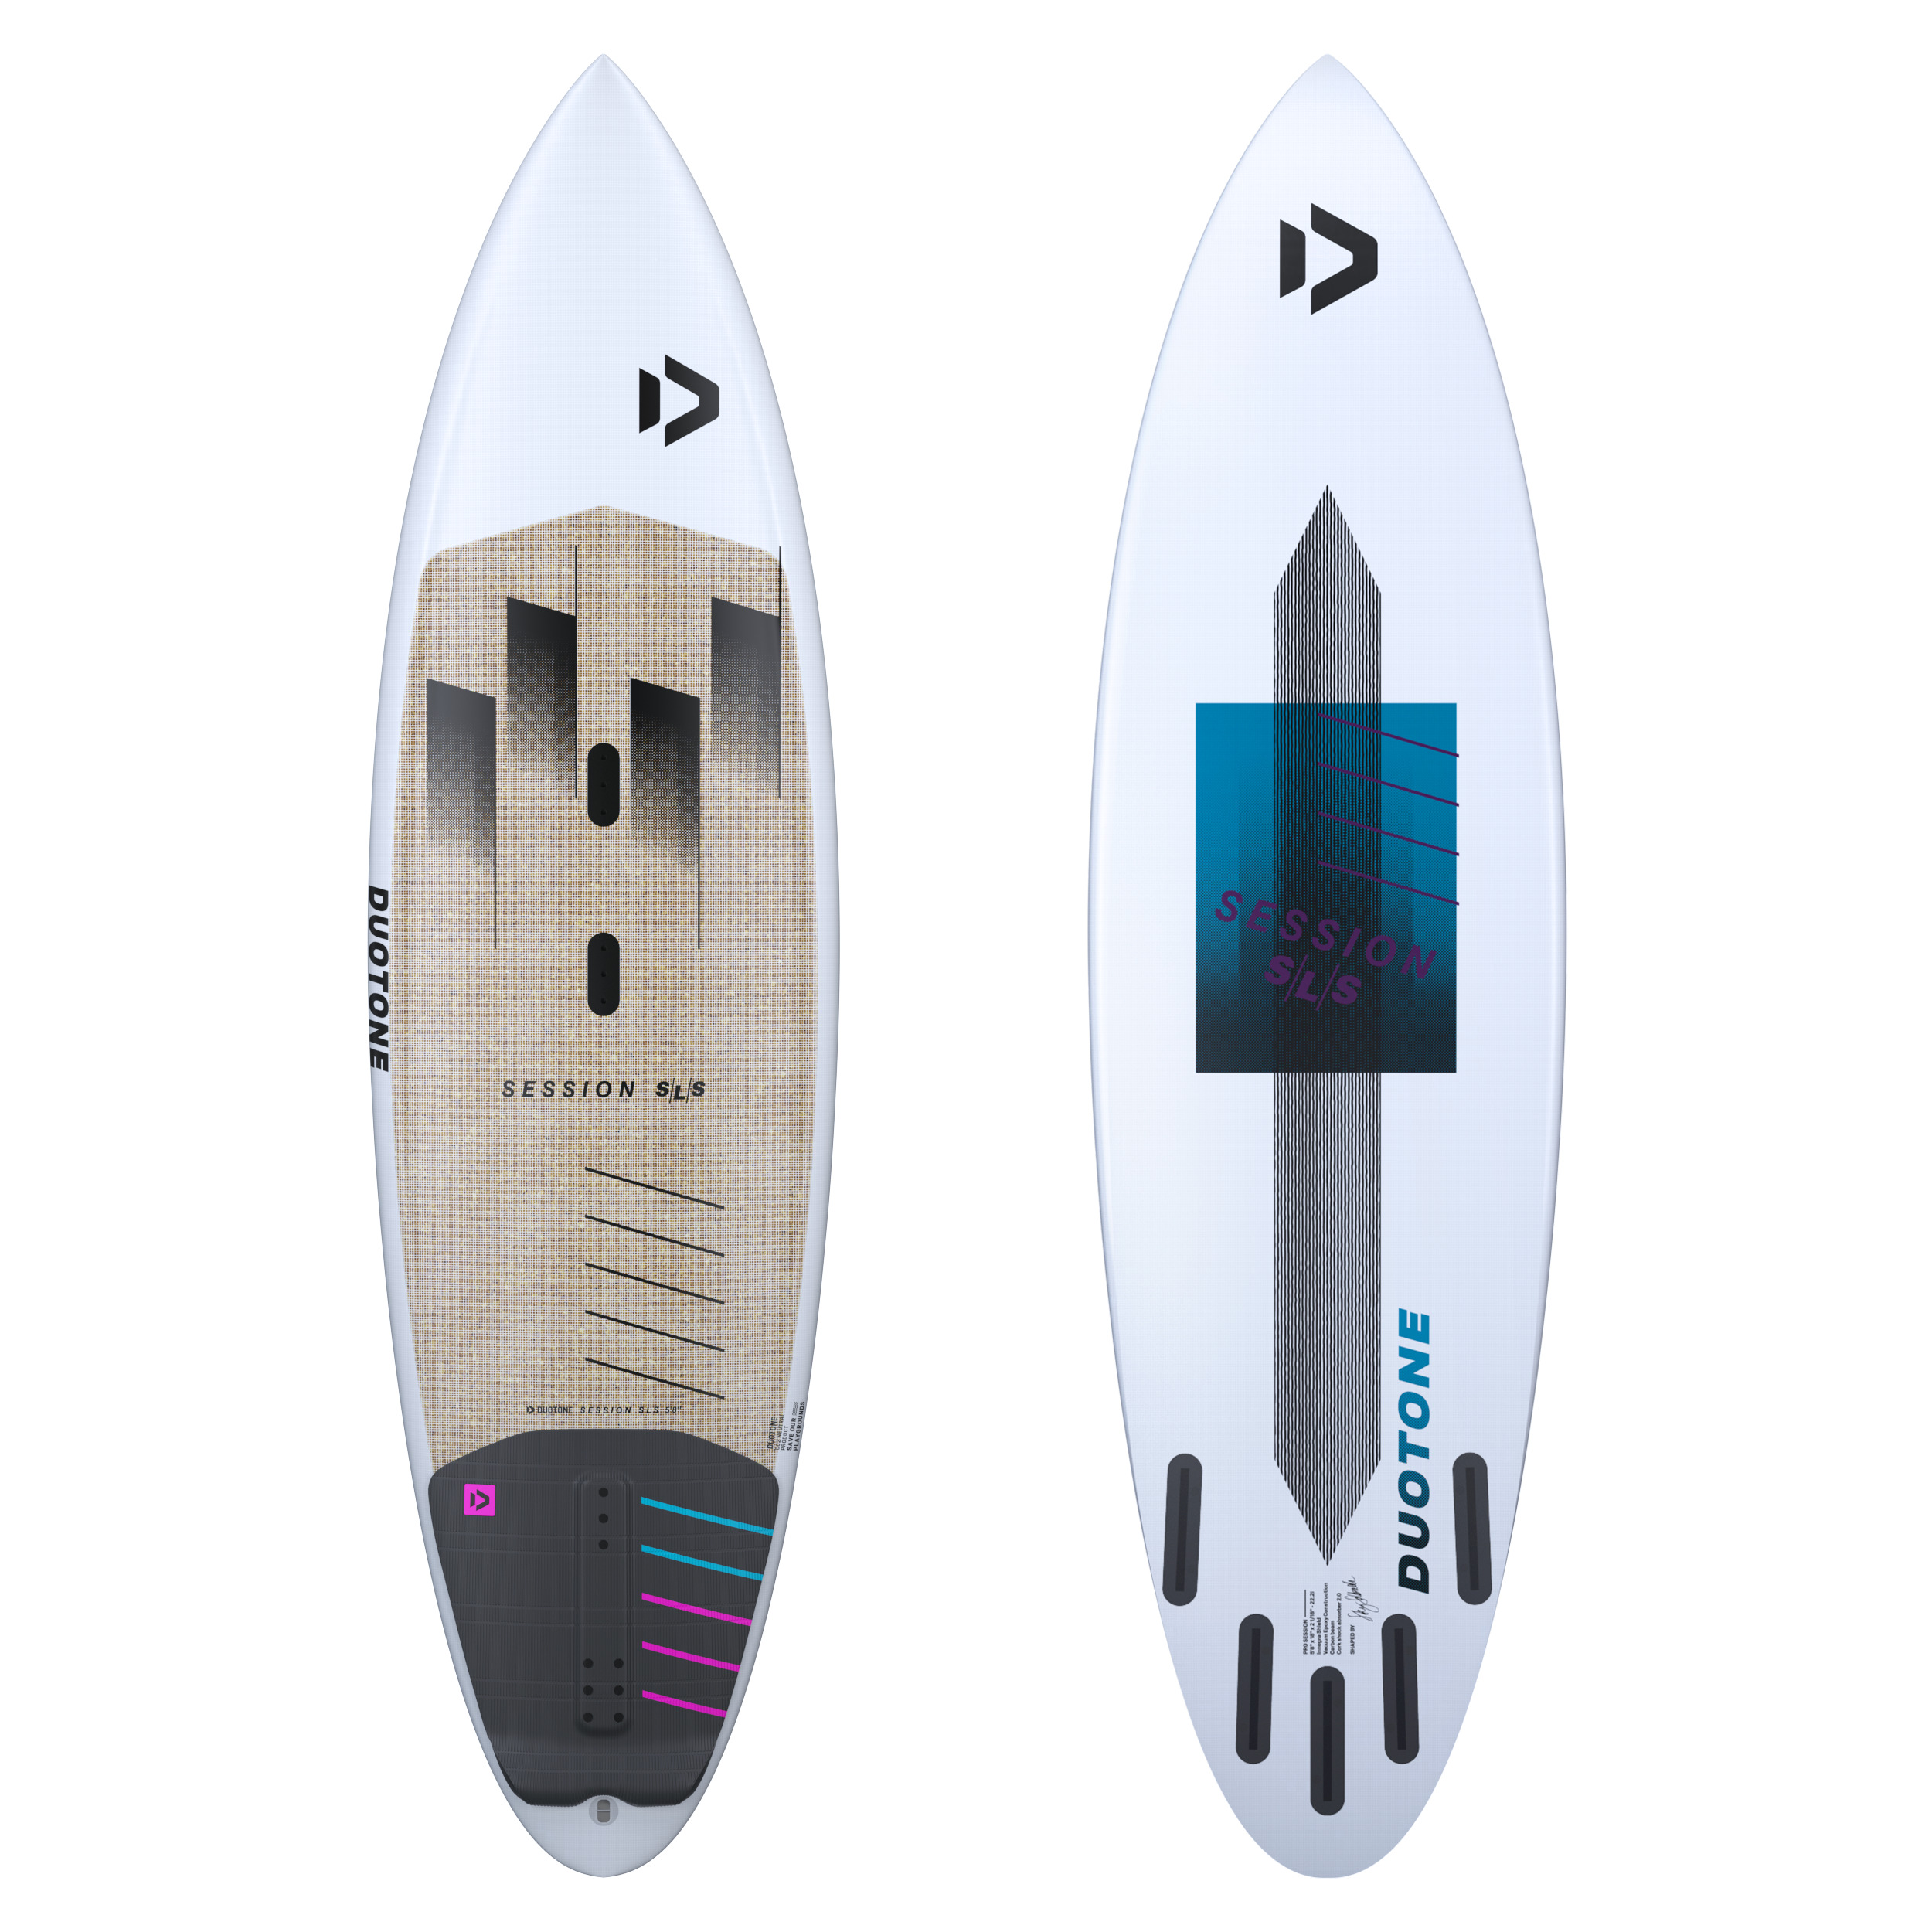 Duotone SESSION SLS Surfboard 2021